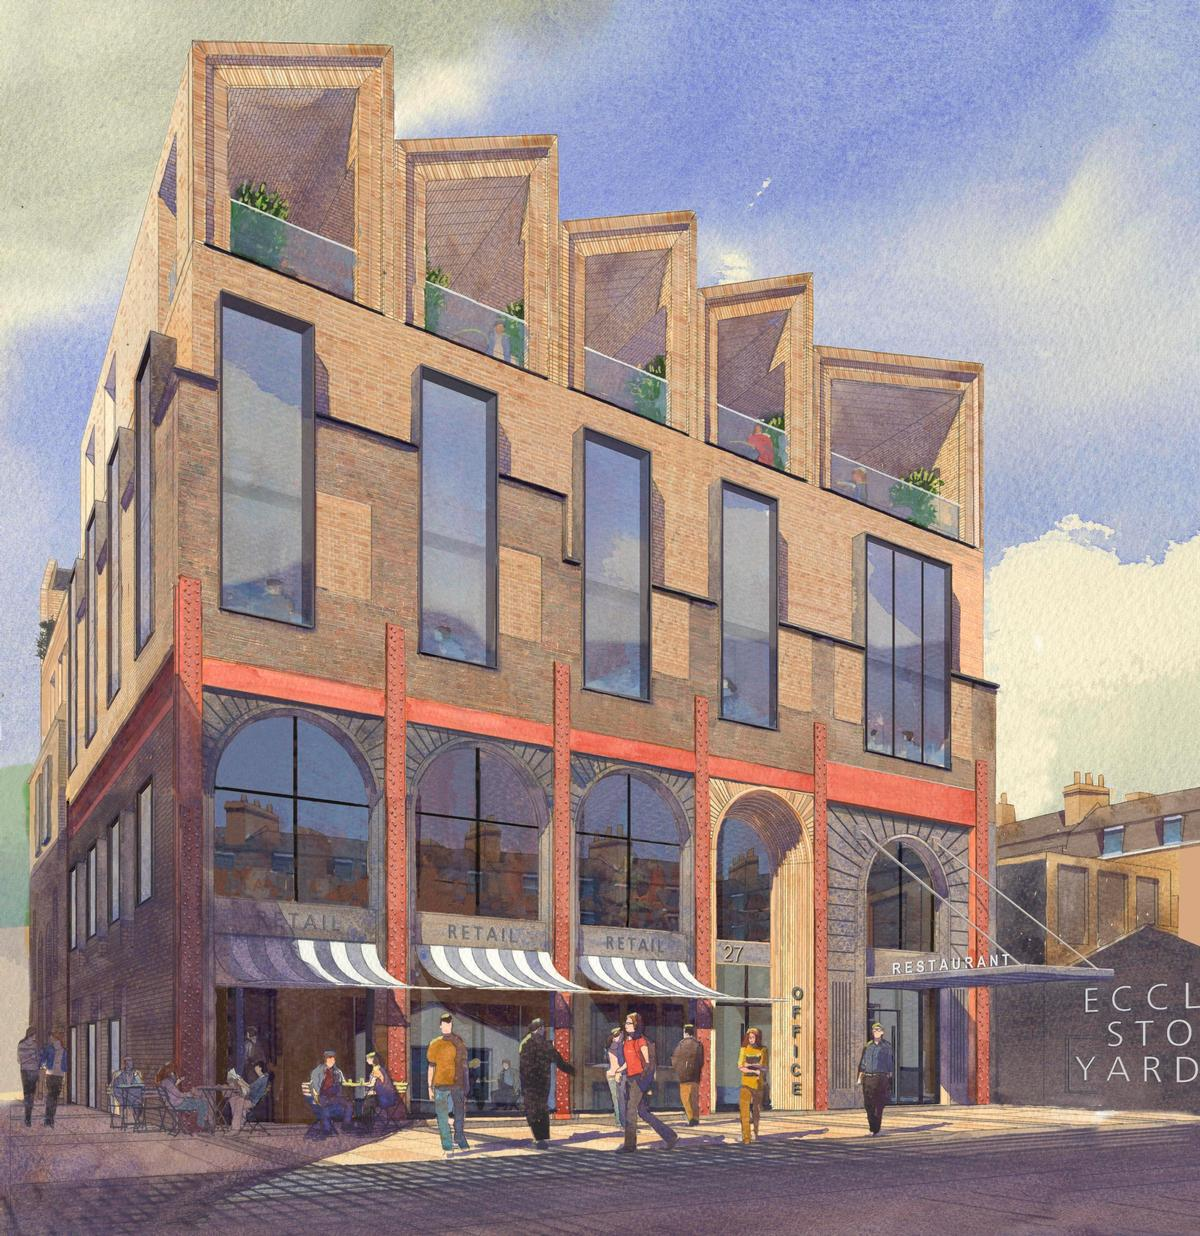 27 Eccleston Place will extend the Eccleston Yards mixed-use development / BuckleyGrayYeoman